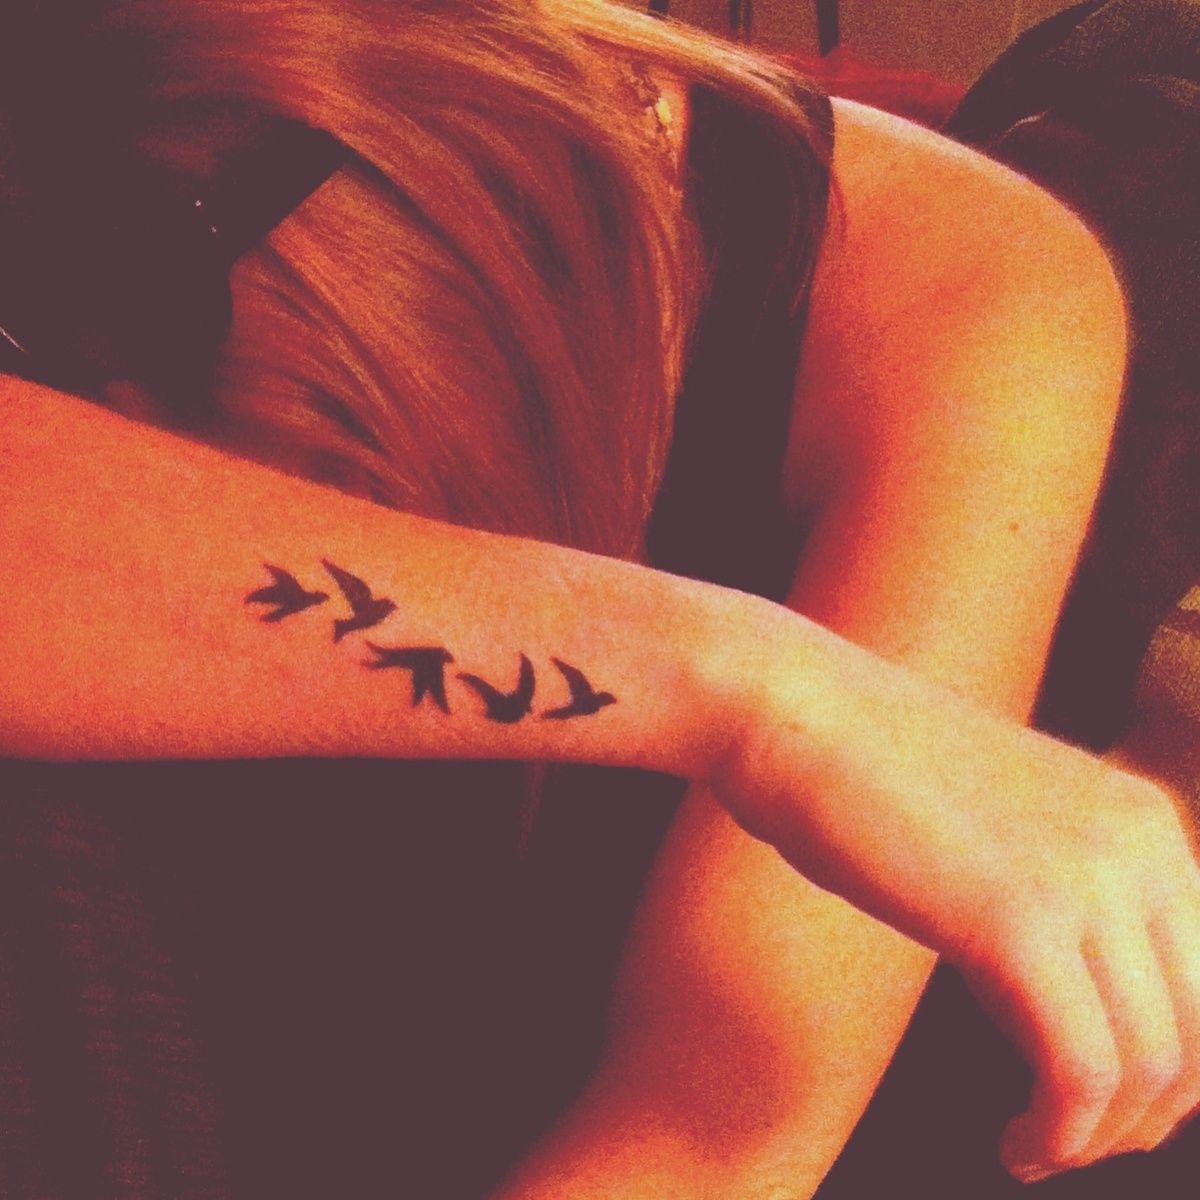 Fdddbeffabcfg pixels tattoo